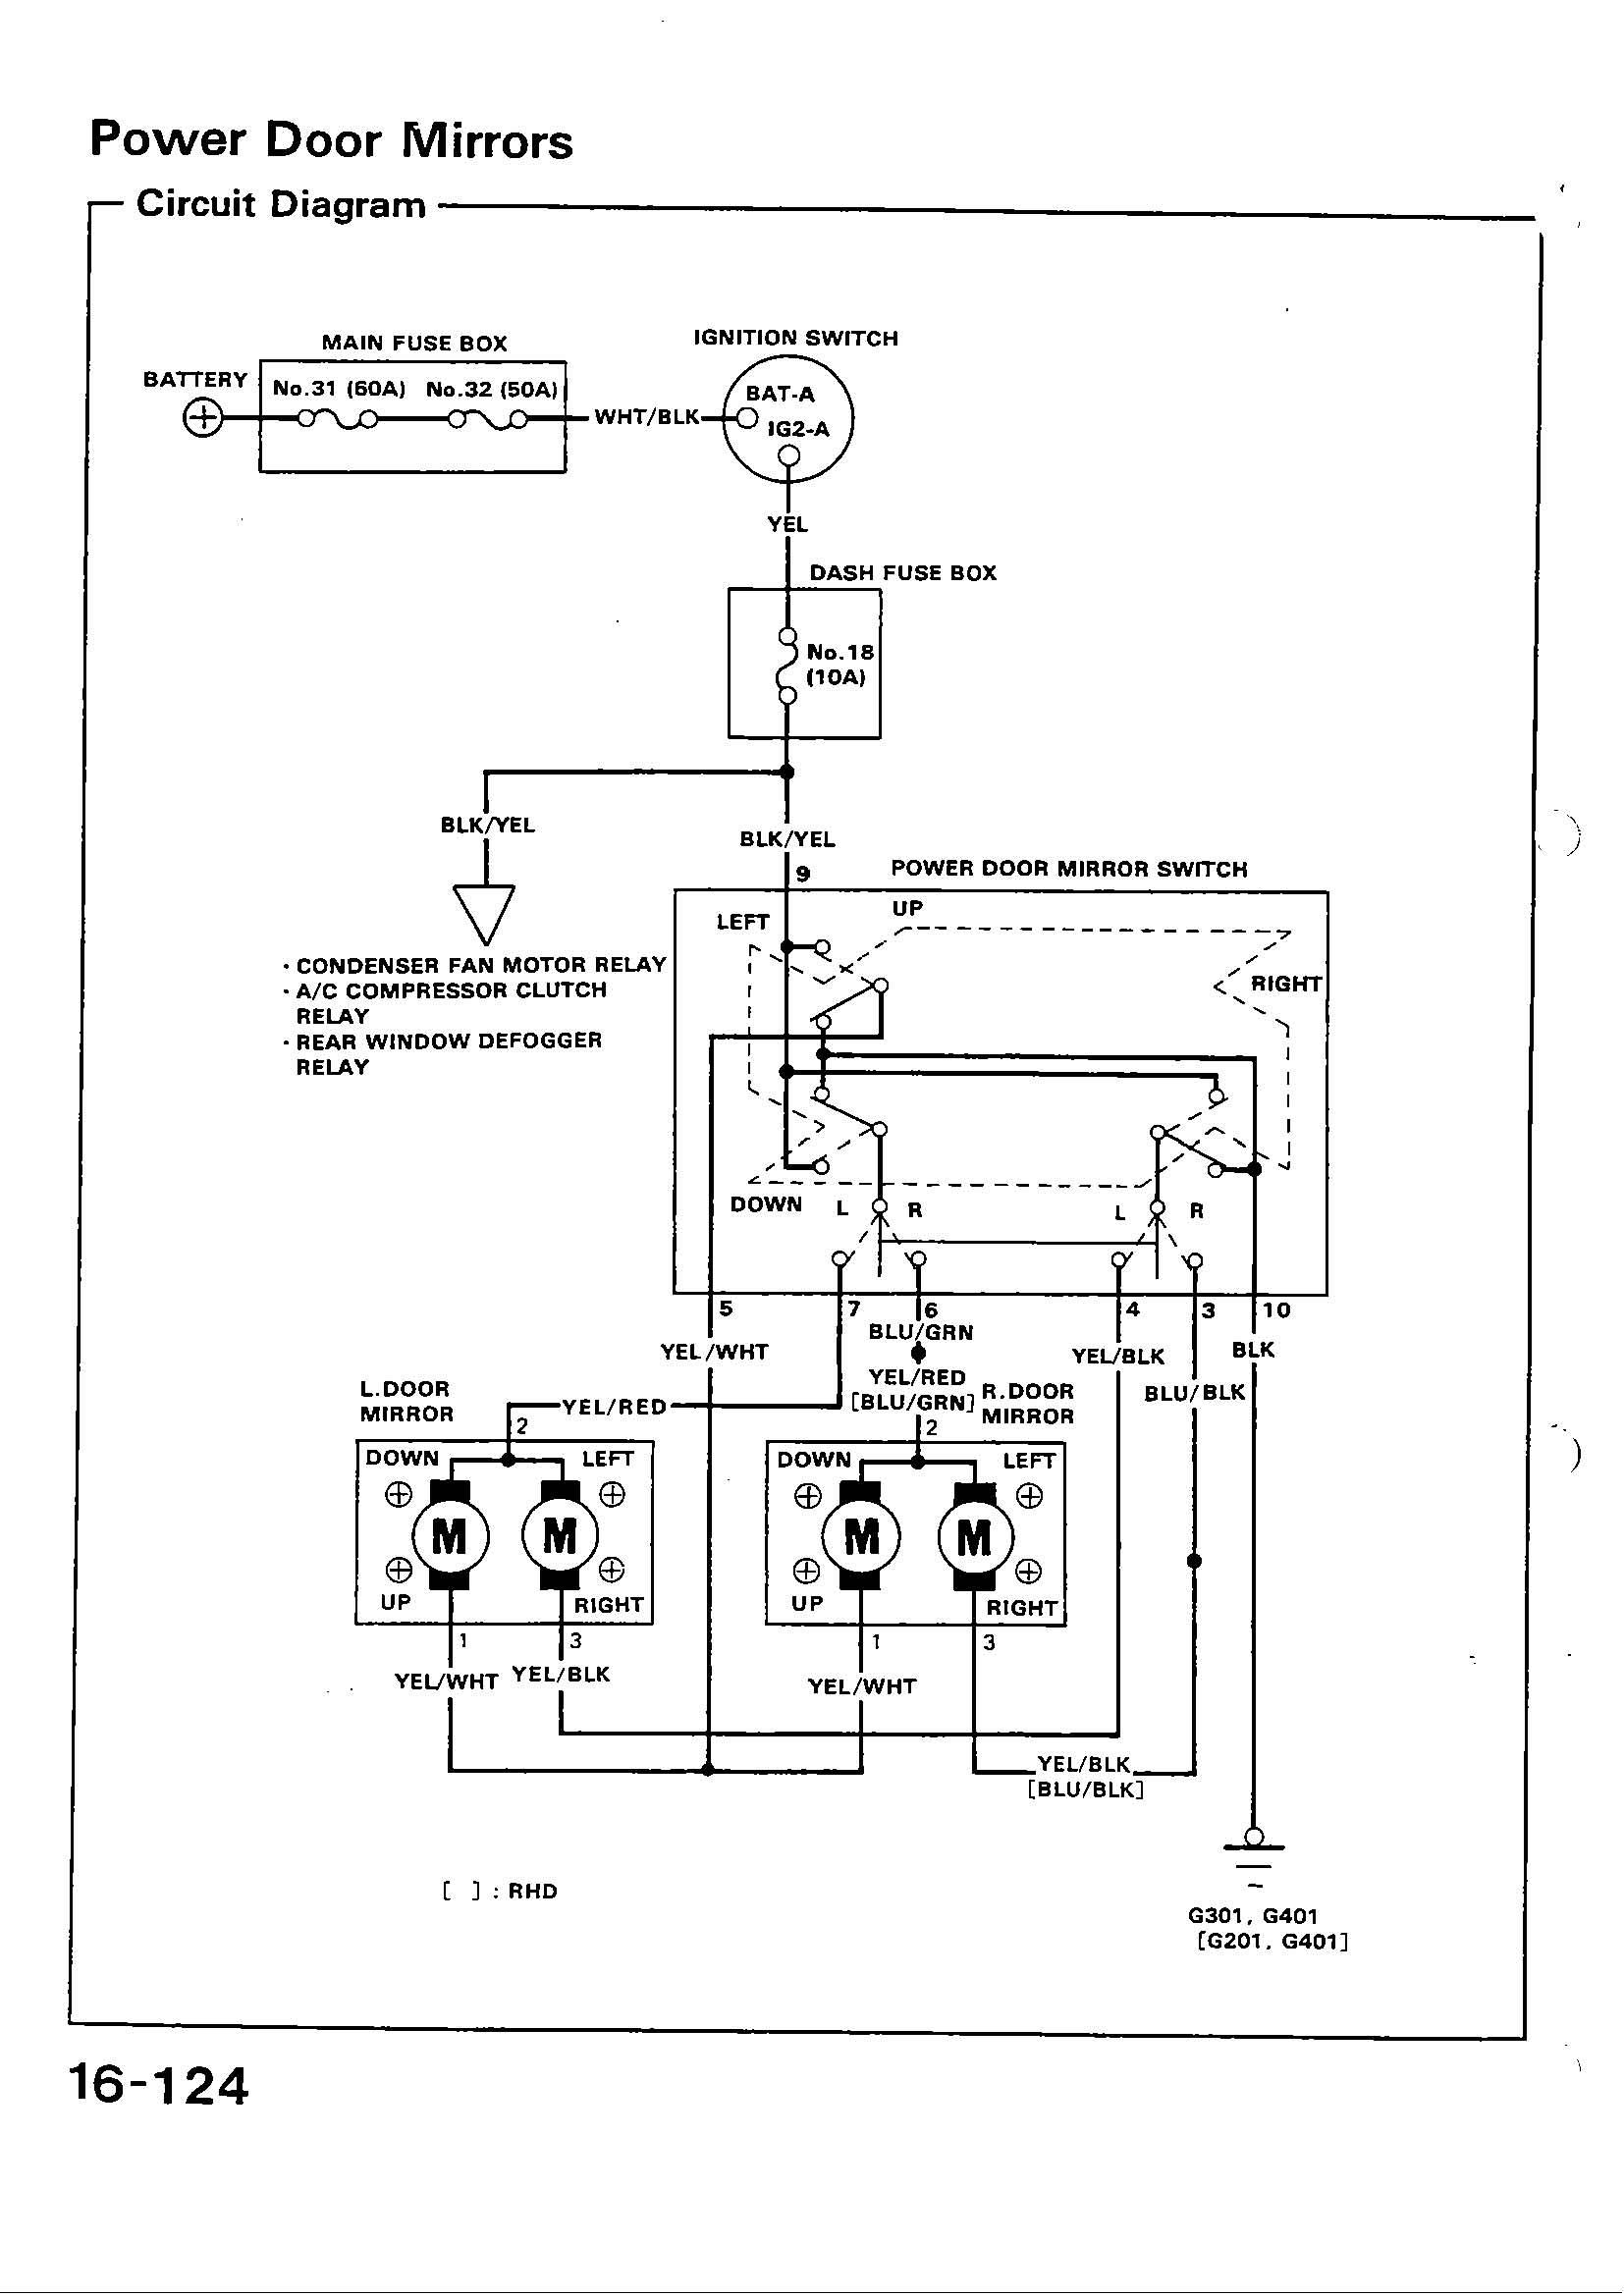 Stupendous Civic Window Motor Diagram Wiring Diagram Wiring Cloud Onicaxeromohammedshrineorg